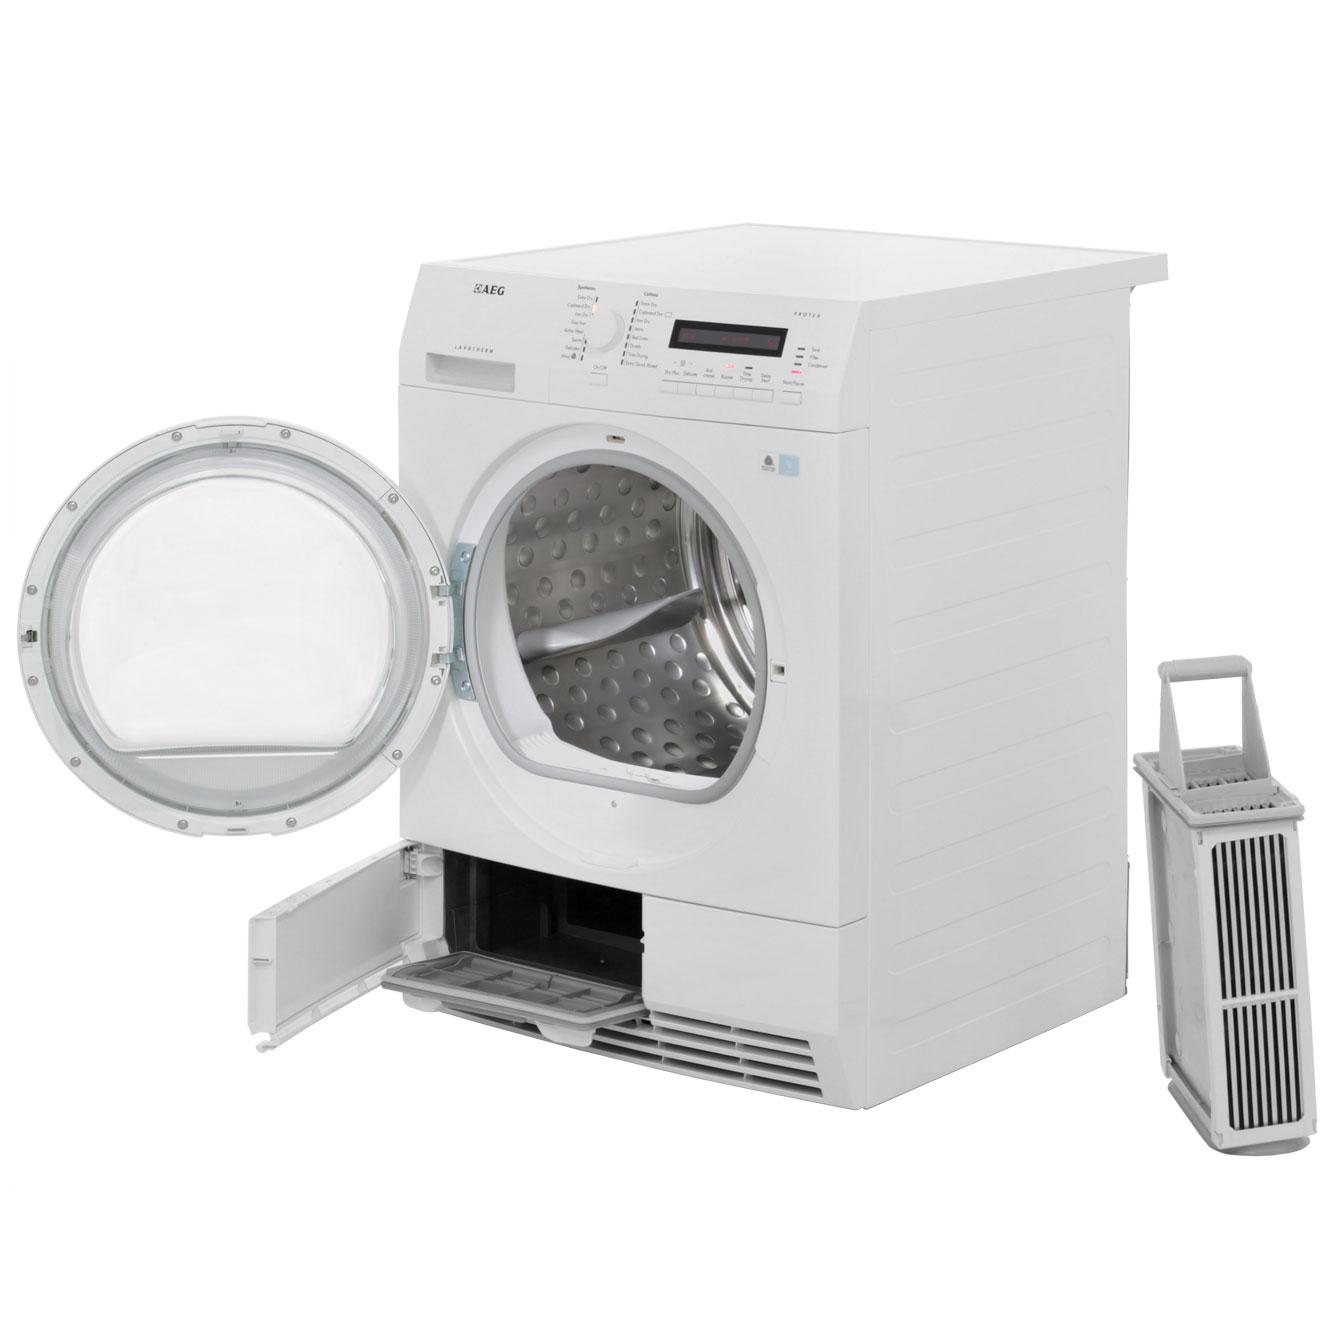 Tumble Dryers Espanol ~ Tumble dryer condenser troubleshooting domex